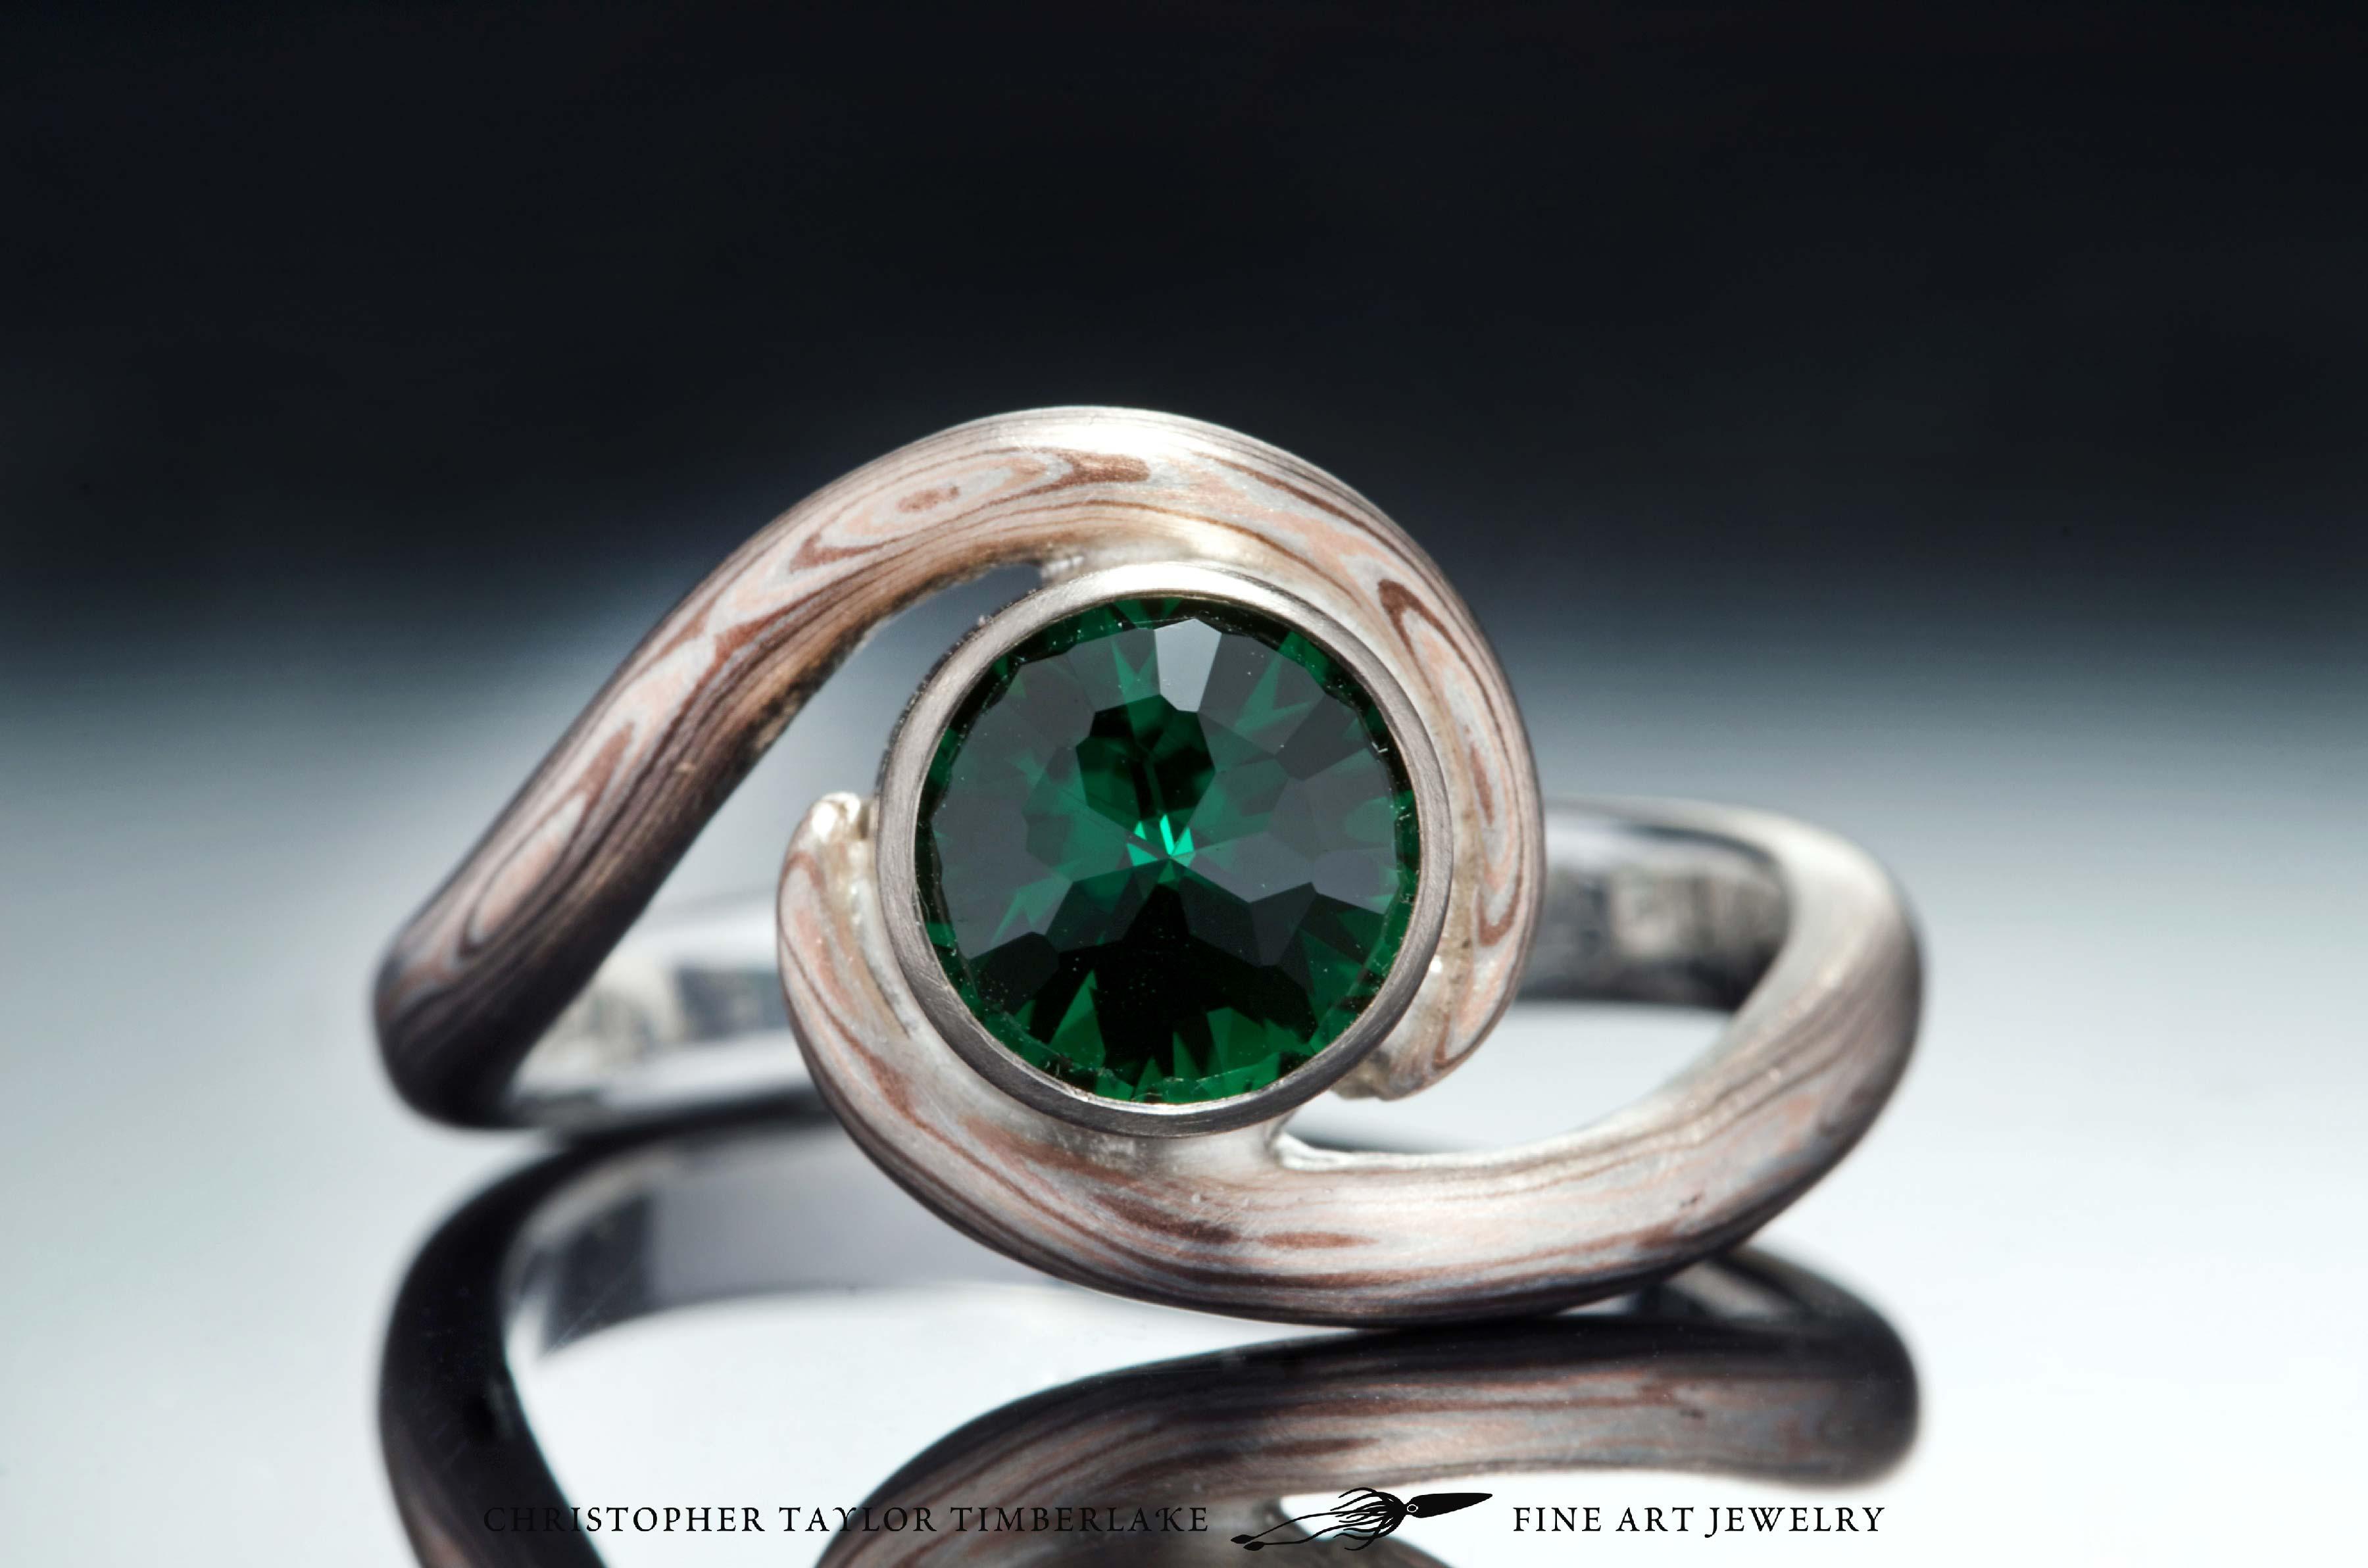 Mokume-(m81)-14-Karat-rose-gold,-shakudo-(2K),-and-sterling-silver-with-Palladium-and-6,31mm-modified-rose-cut-round-chrome-green-tourmaline-1